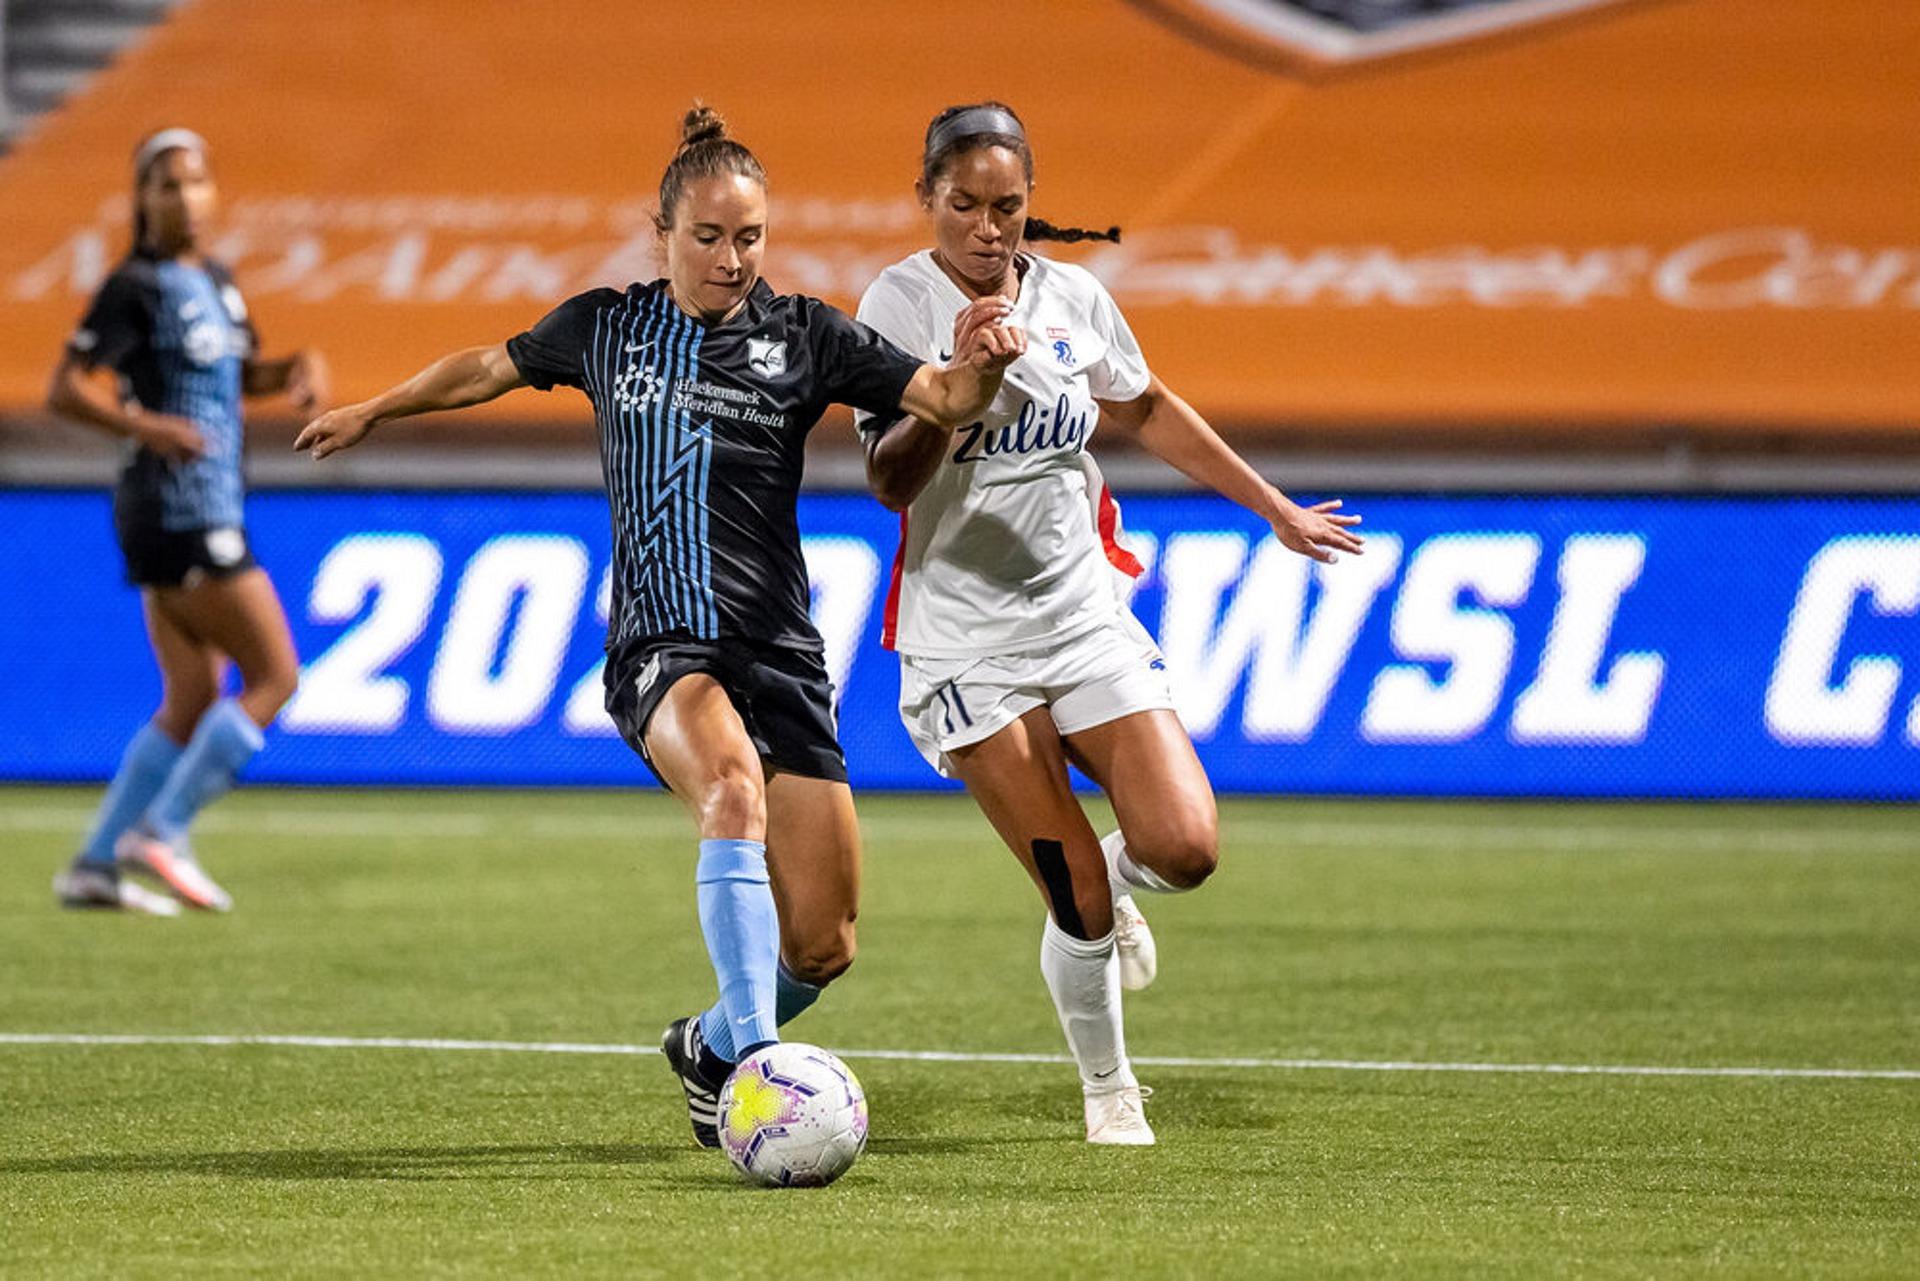 Sportclub Groessen wil starten met damesvoetbal